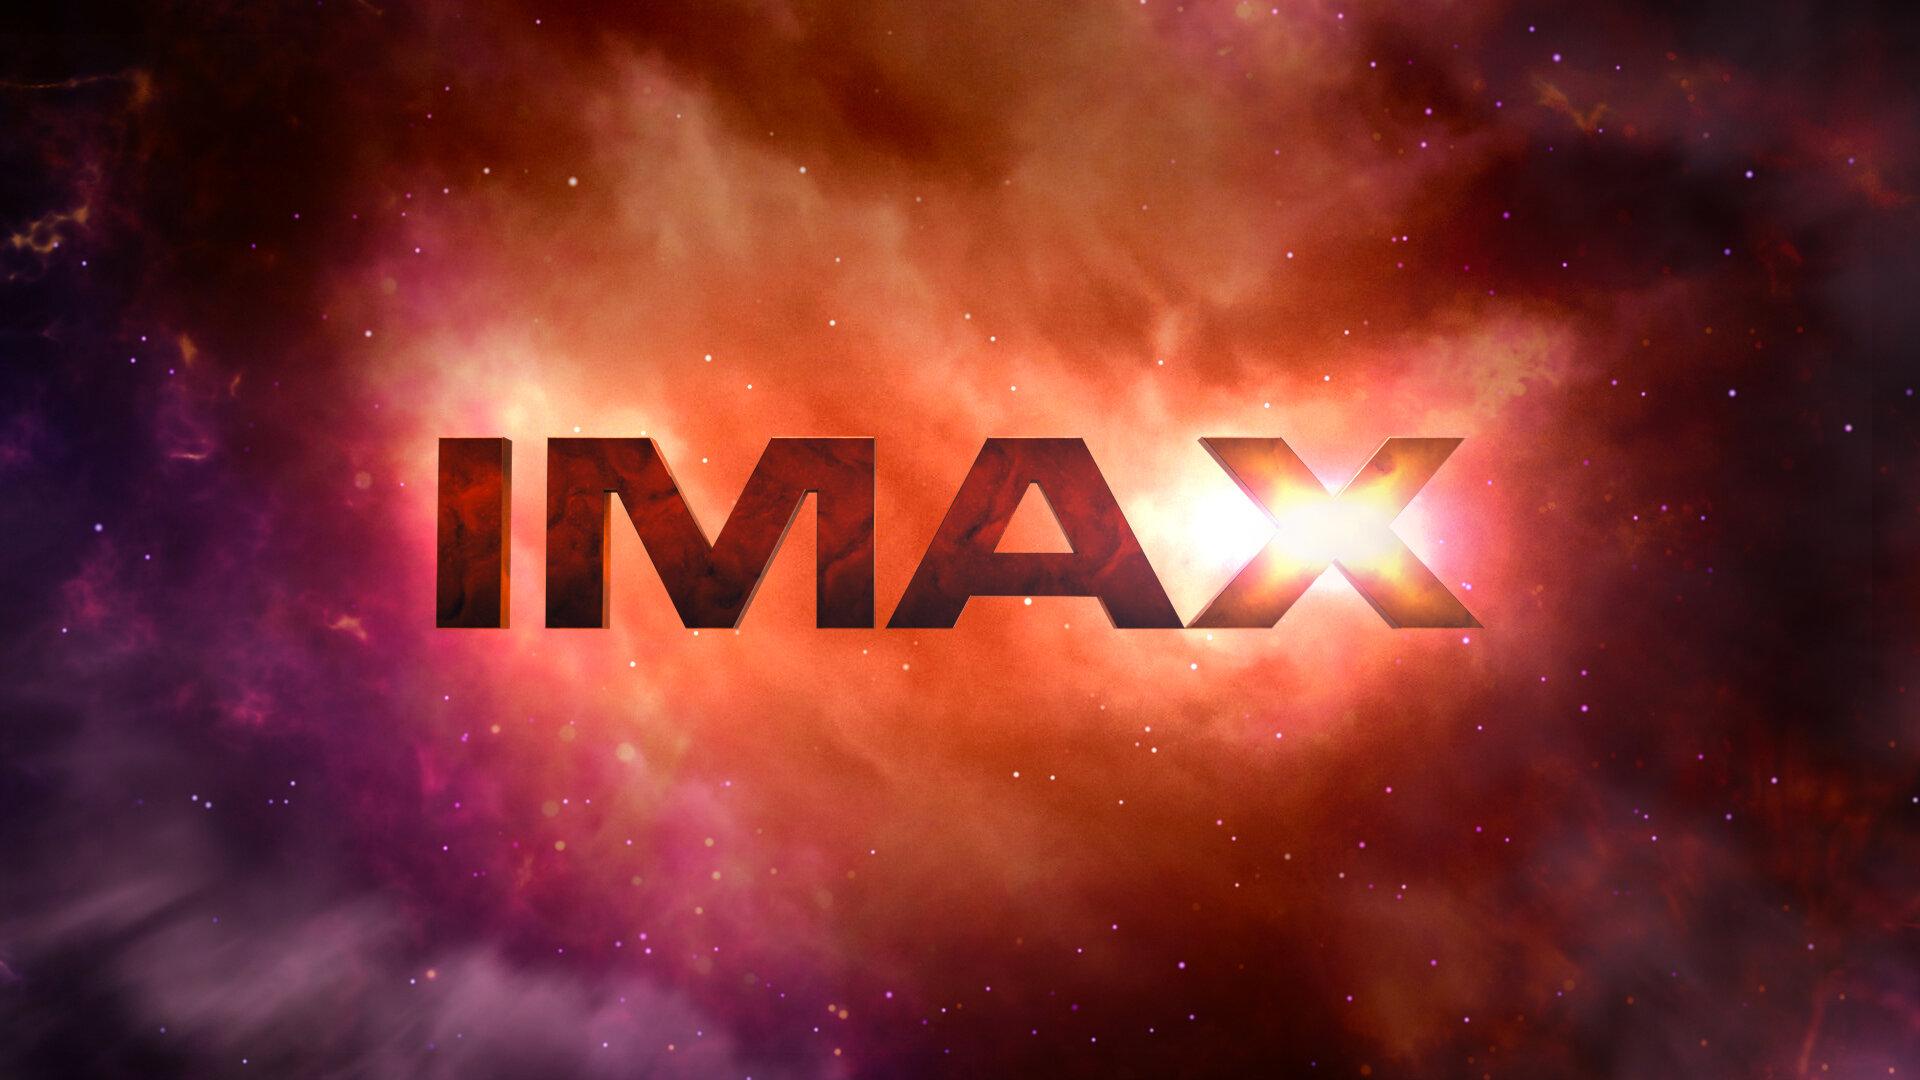 IMAX_DP_BL_03_02.jpg